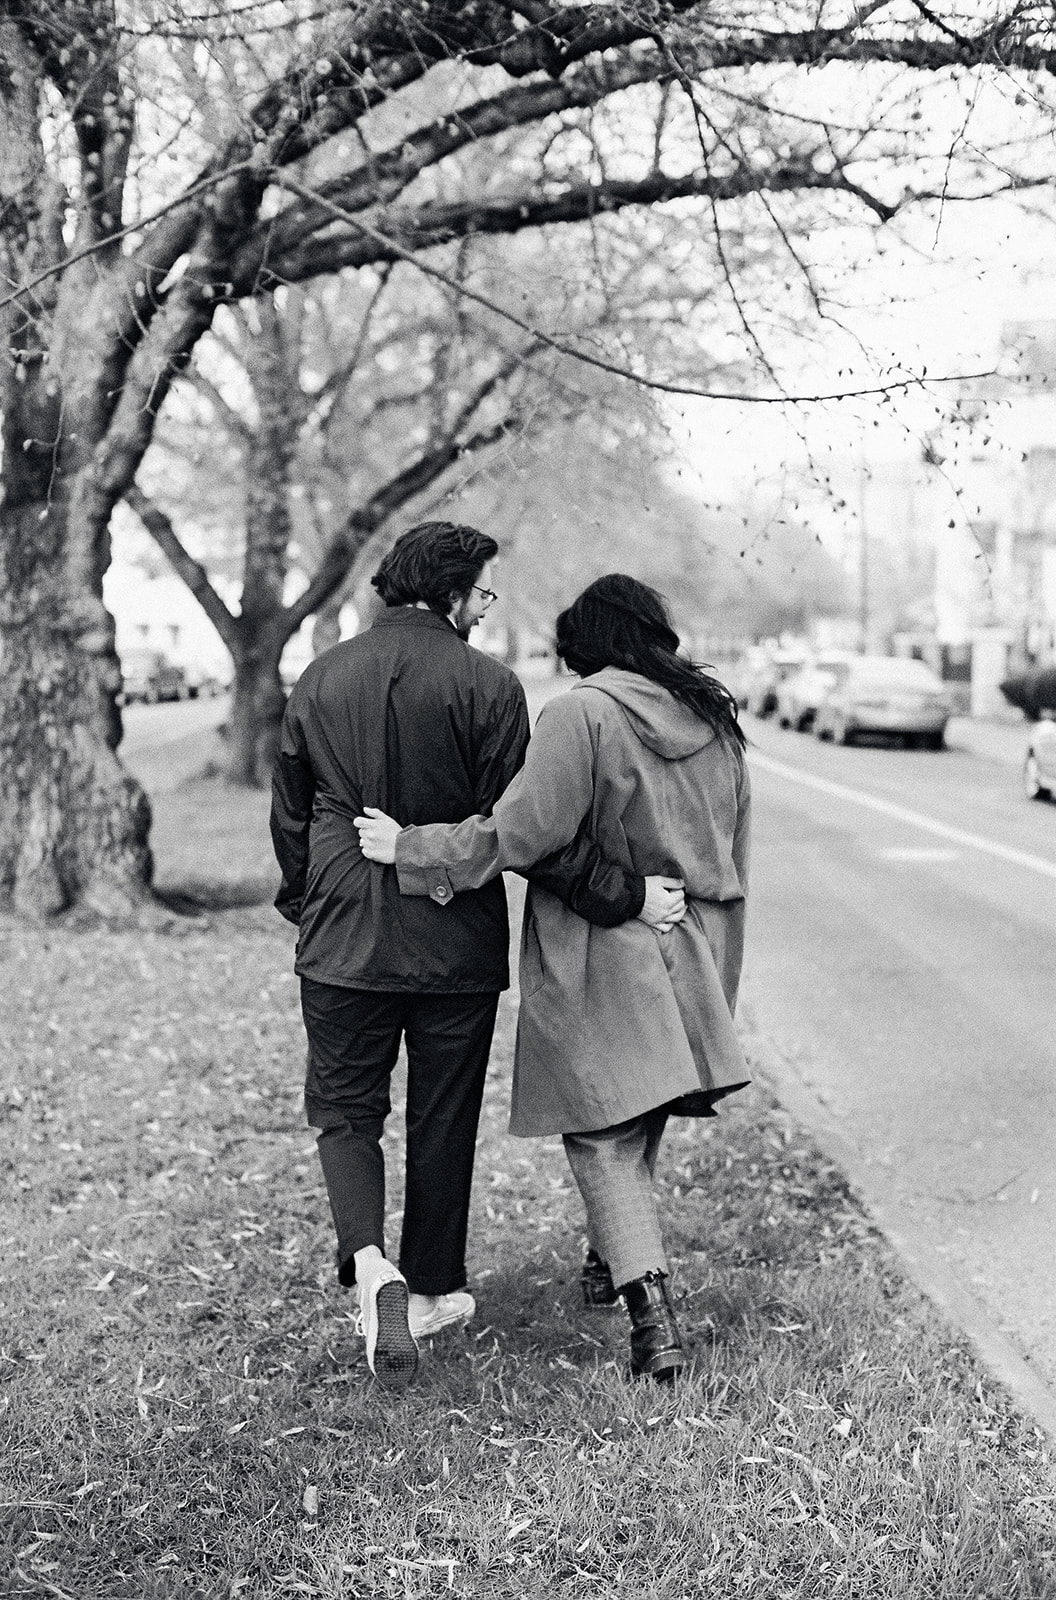 Kate-Brandon-Engagement-2019-04-27-Alycia-Lovell-Photography-53_websize.jpg